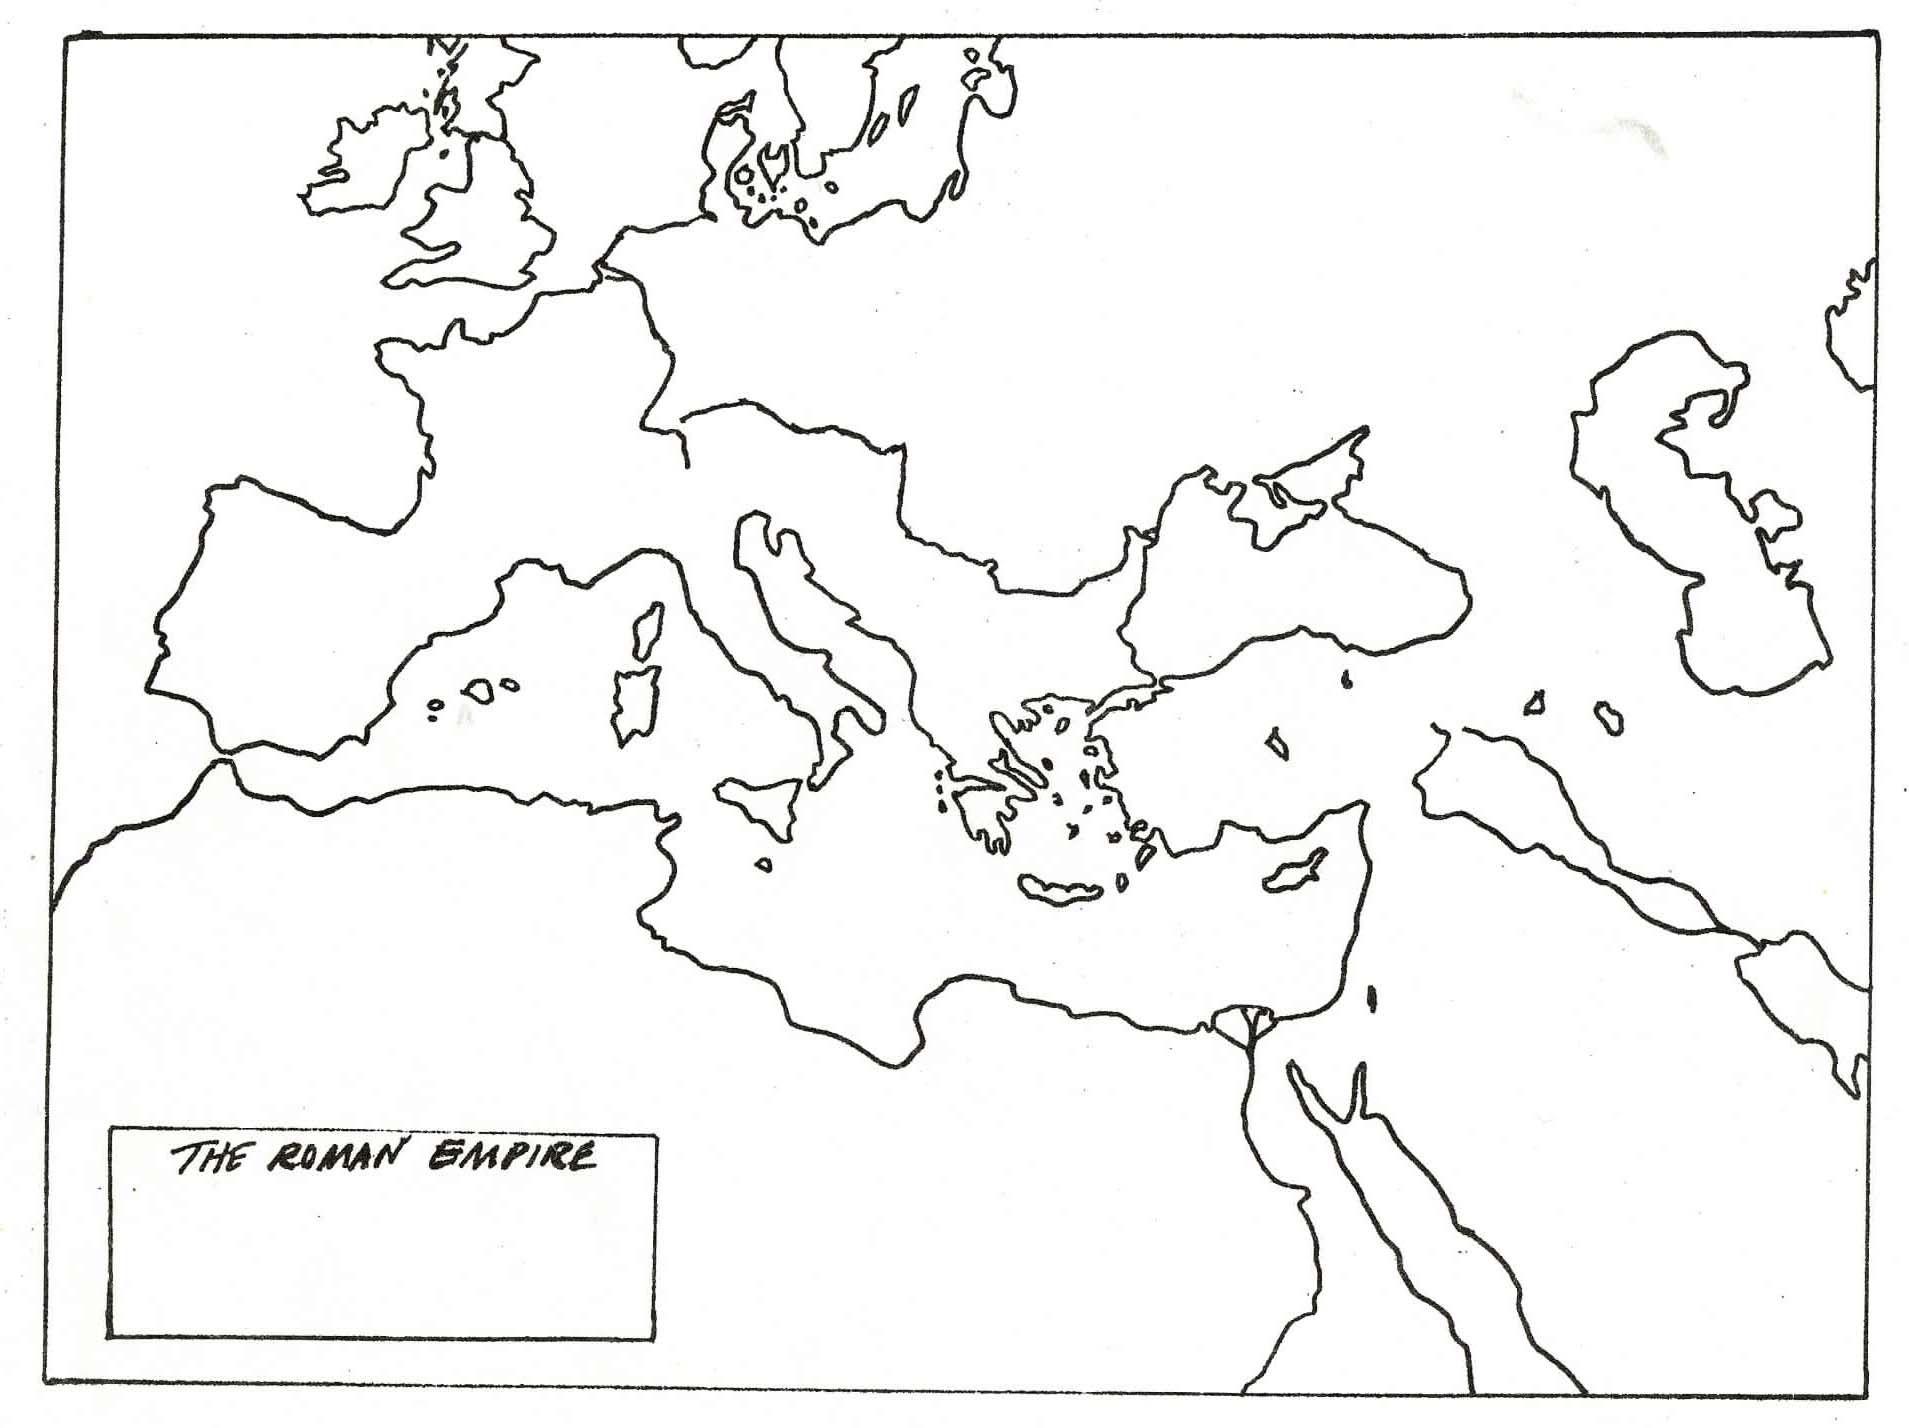 Blank Map Of Roman Empire